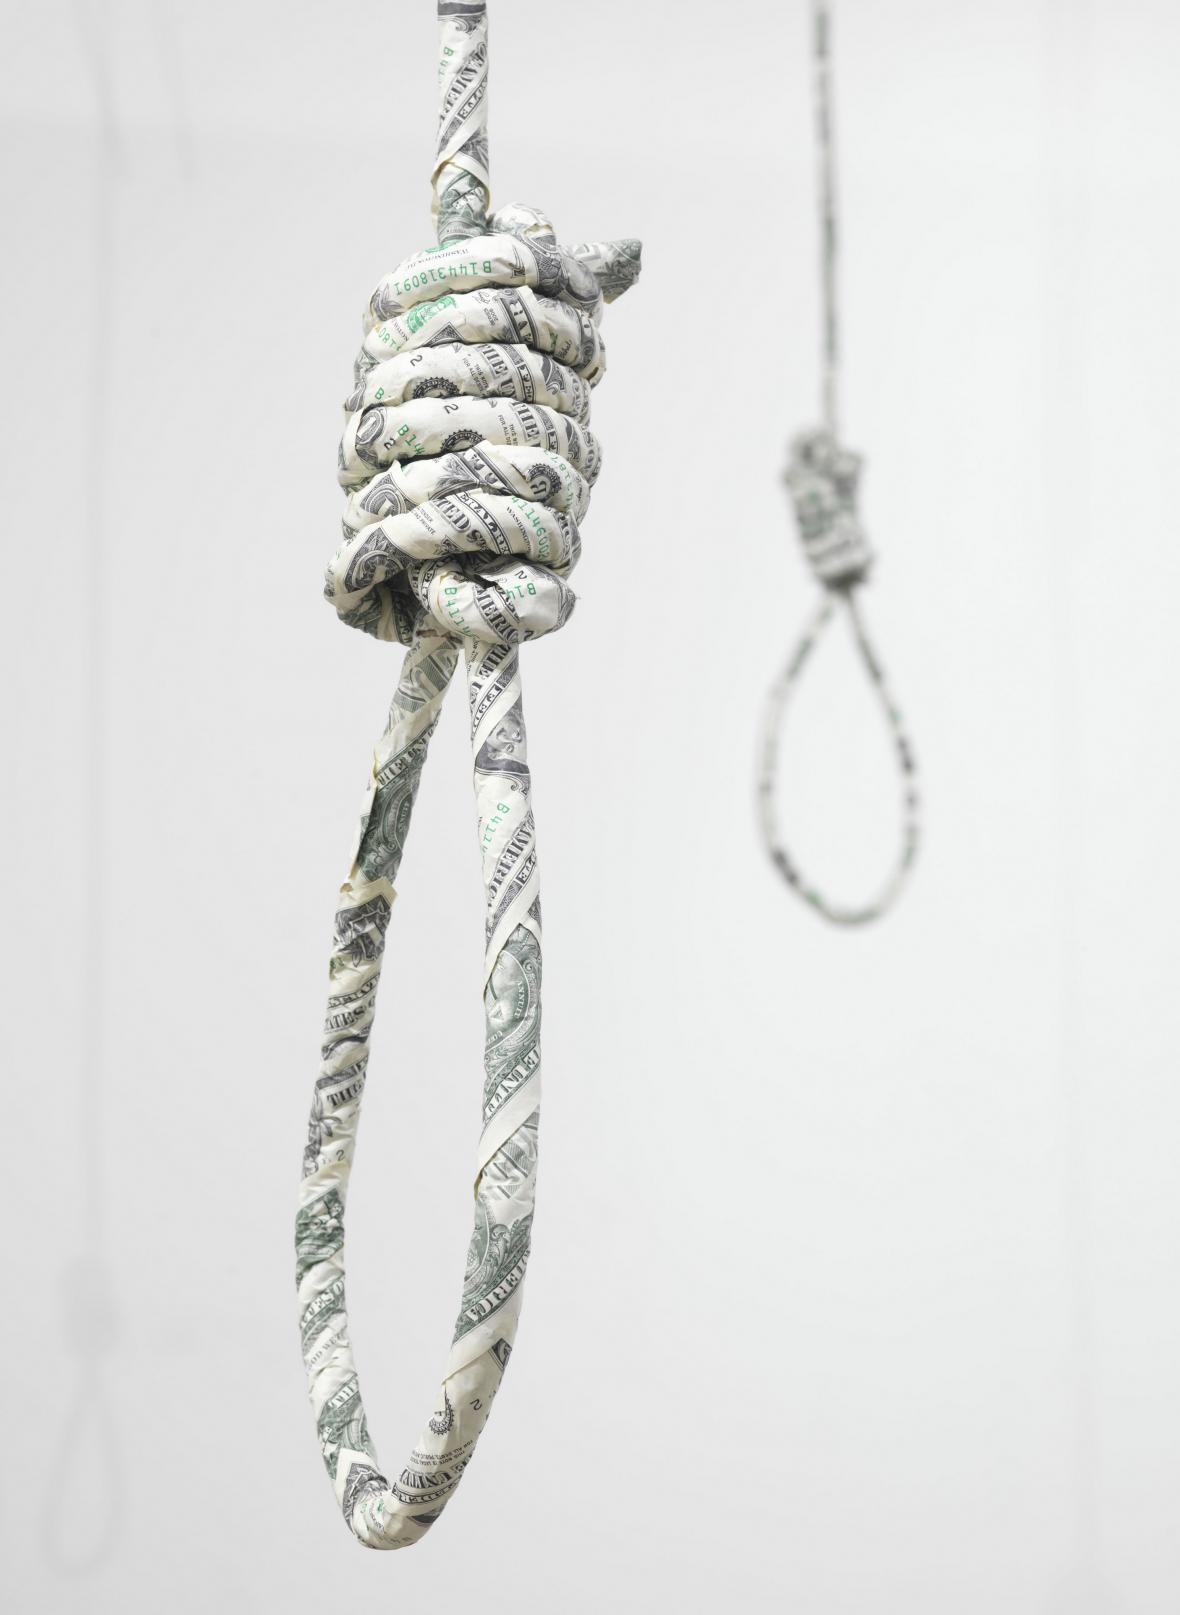 Jota Castro / Zeitgeist, 2012